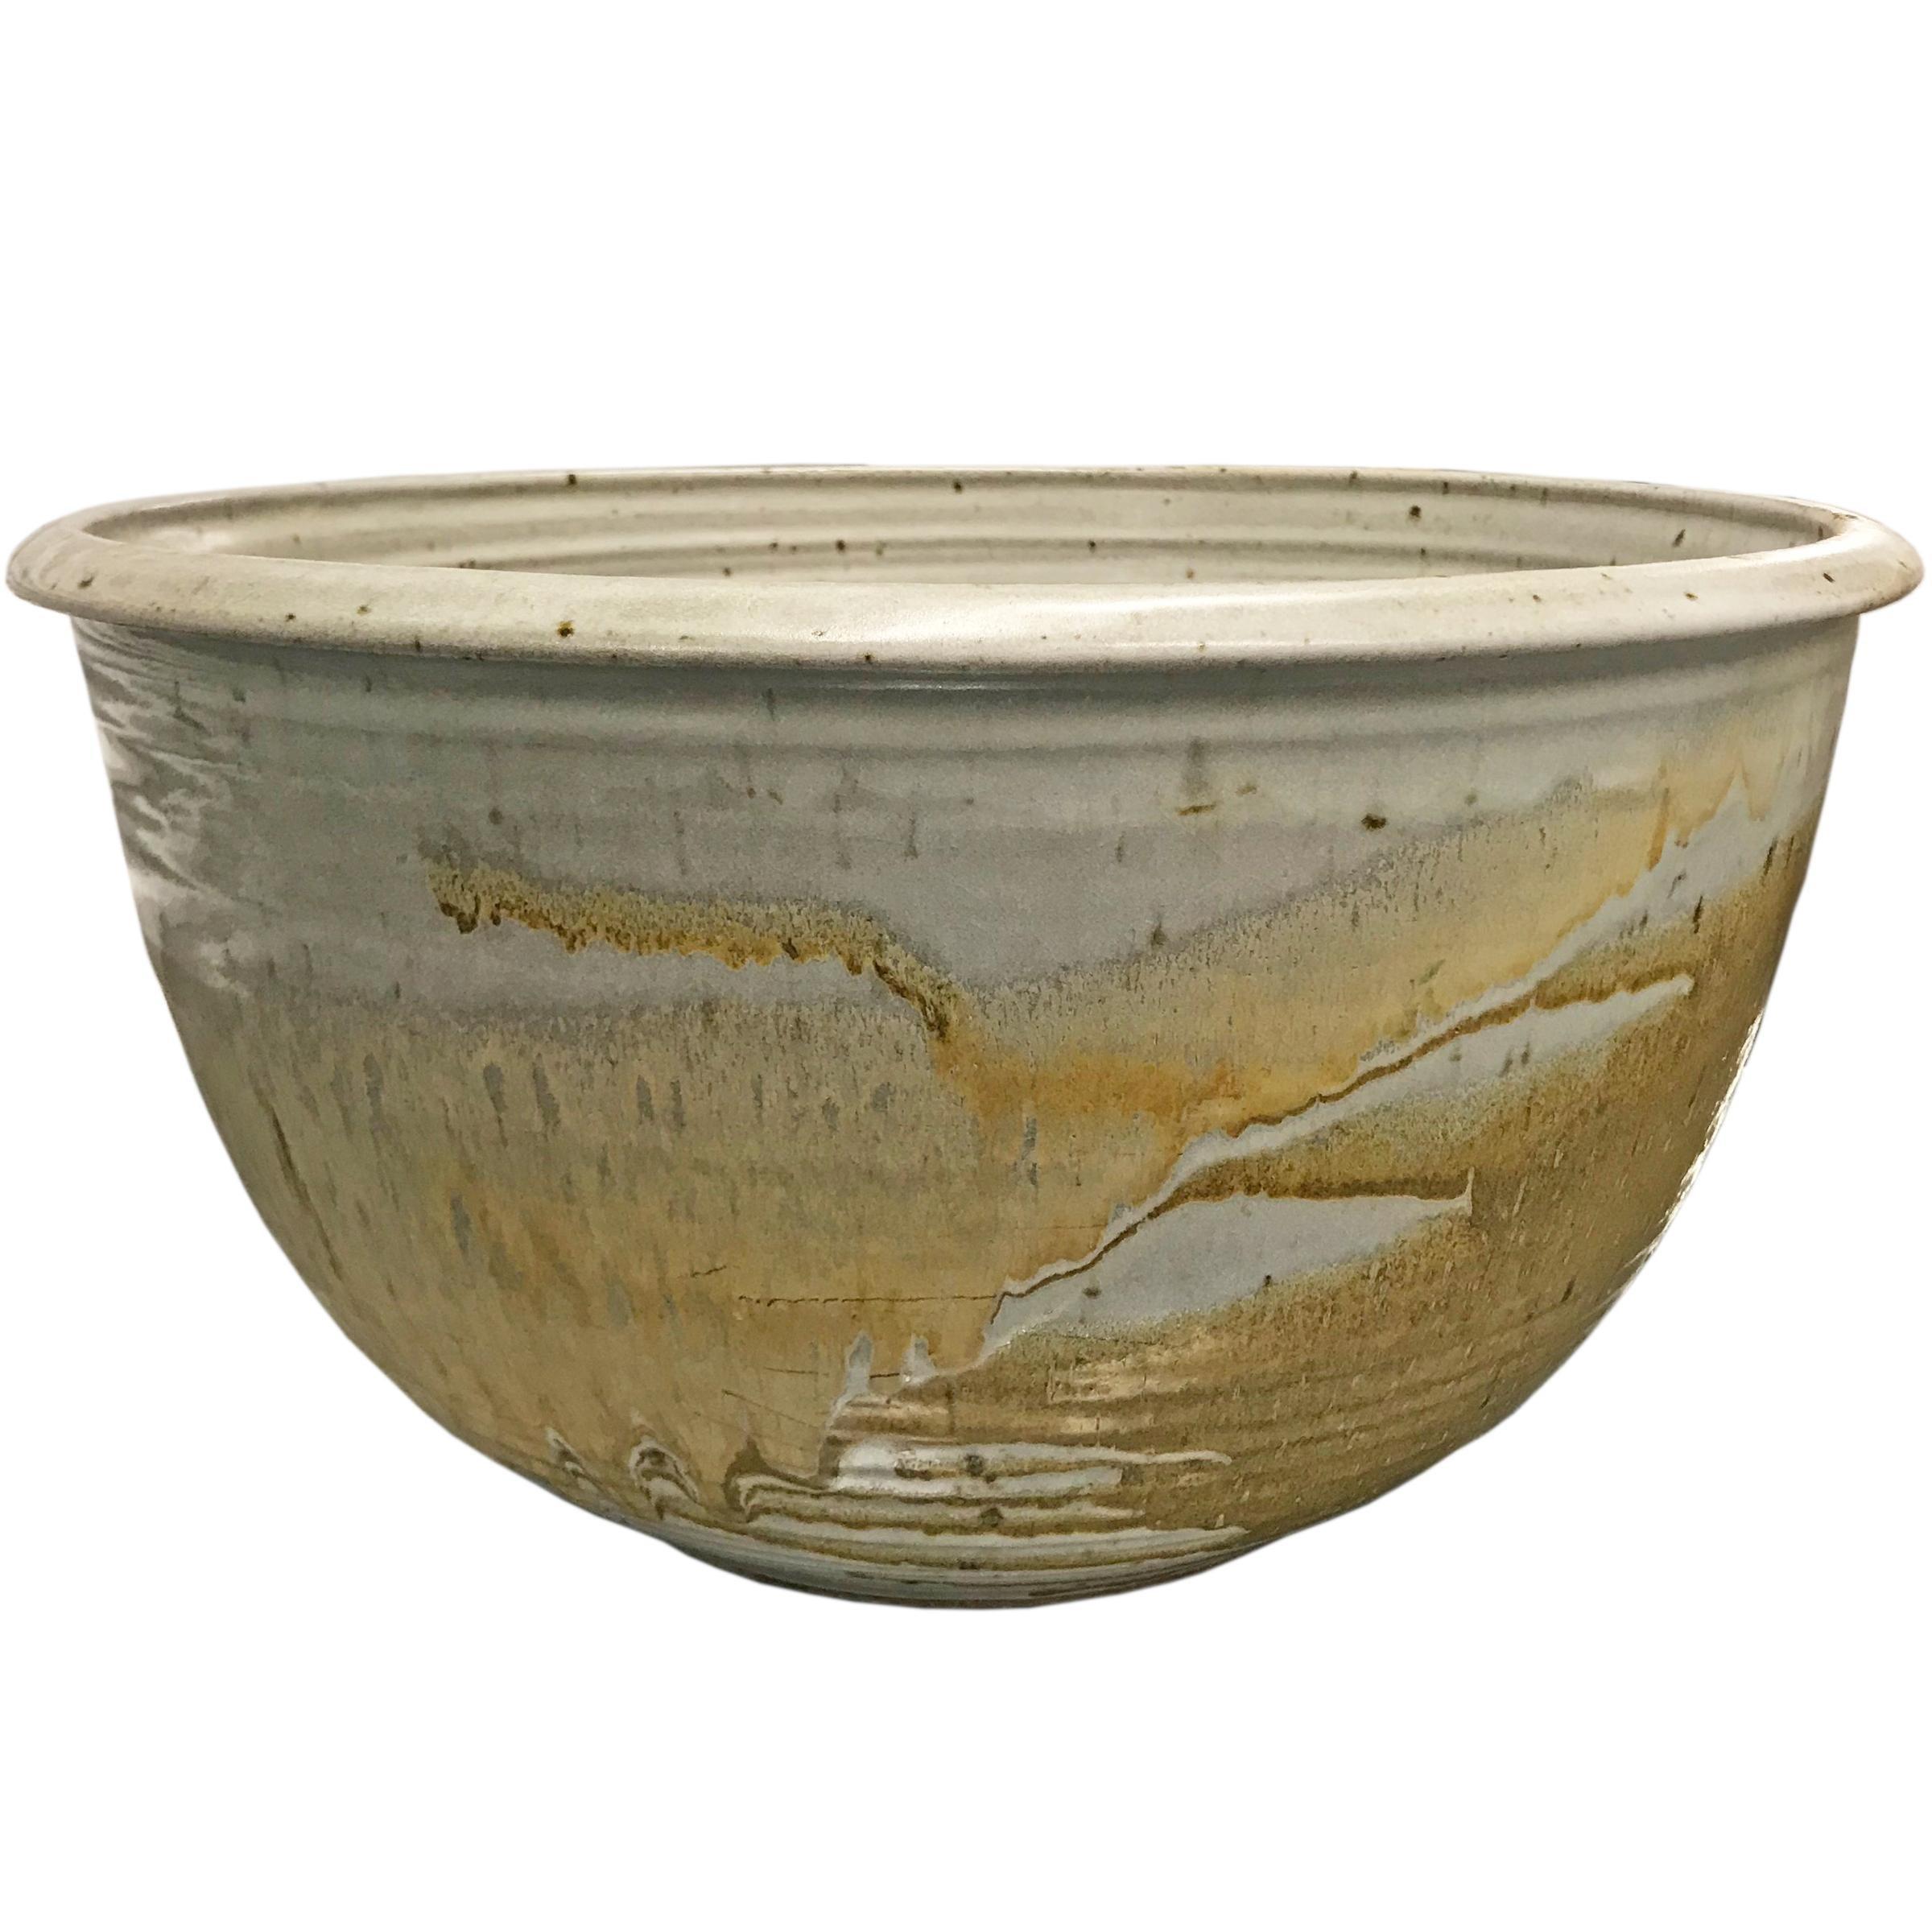 Monumental Mid-20th Century American Studio Pottery Bowl